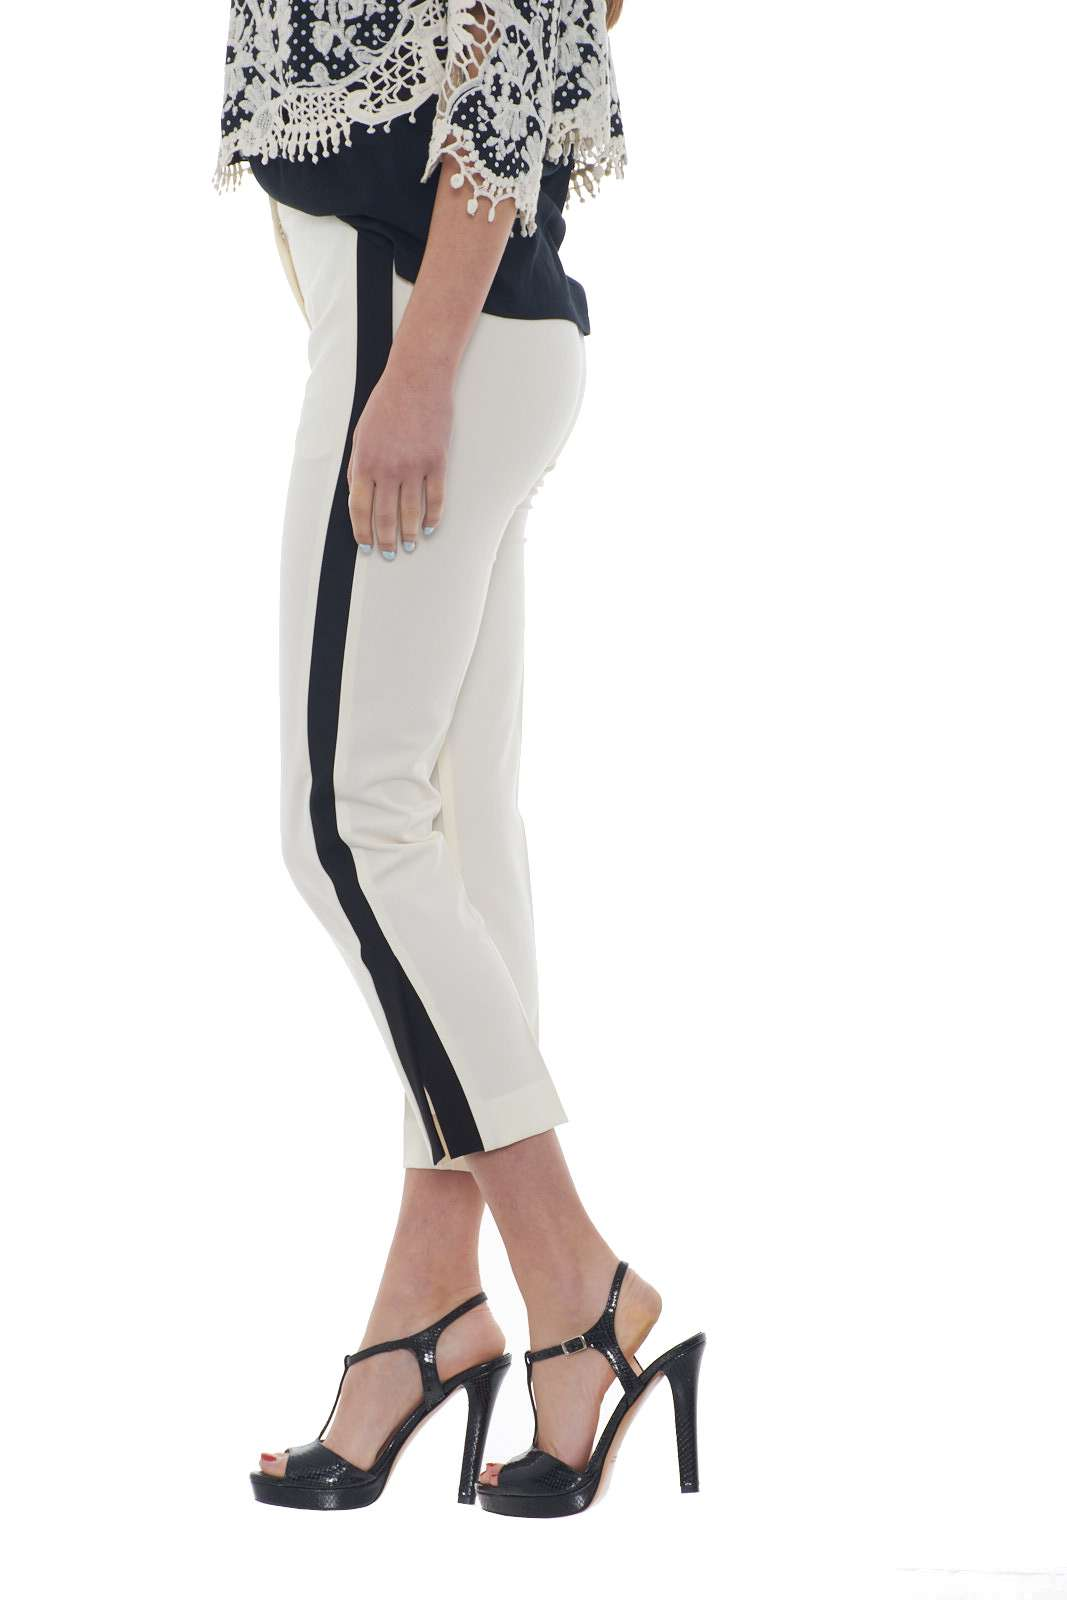 https://www.parmax.com/media/catalog/product/a/i/PE-outlet_parmax-pantaloni-donna-Ekl%C3%A8-1015827-B.jpg